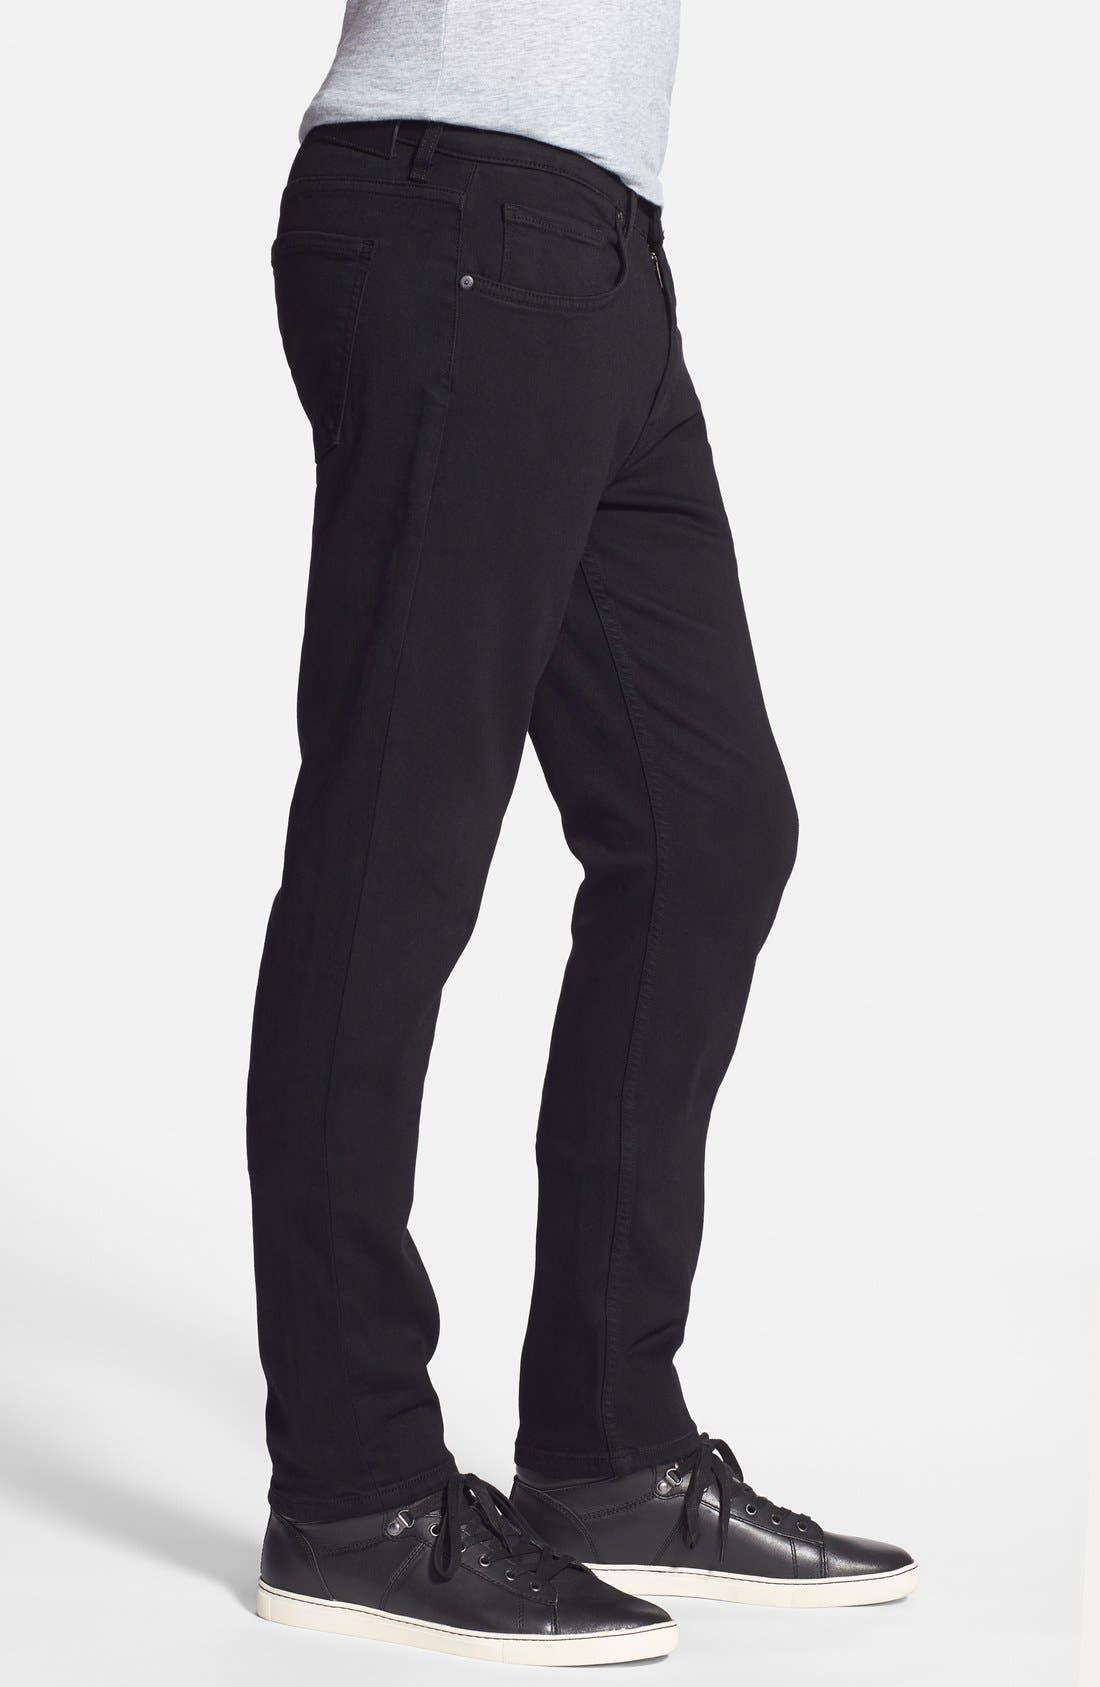 Transcend - Lennox XL Slim Fit Jeans,                             Alternate thumbnail 4, color,                             BLACK